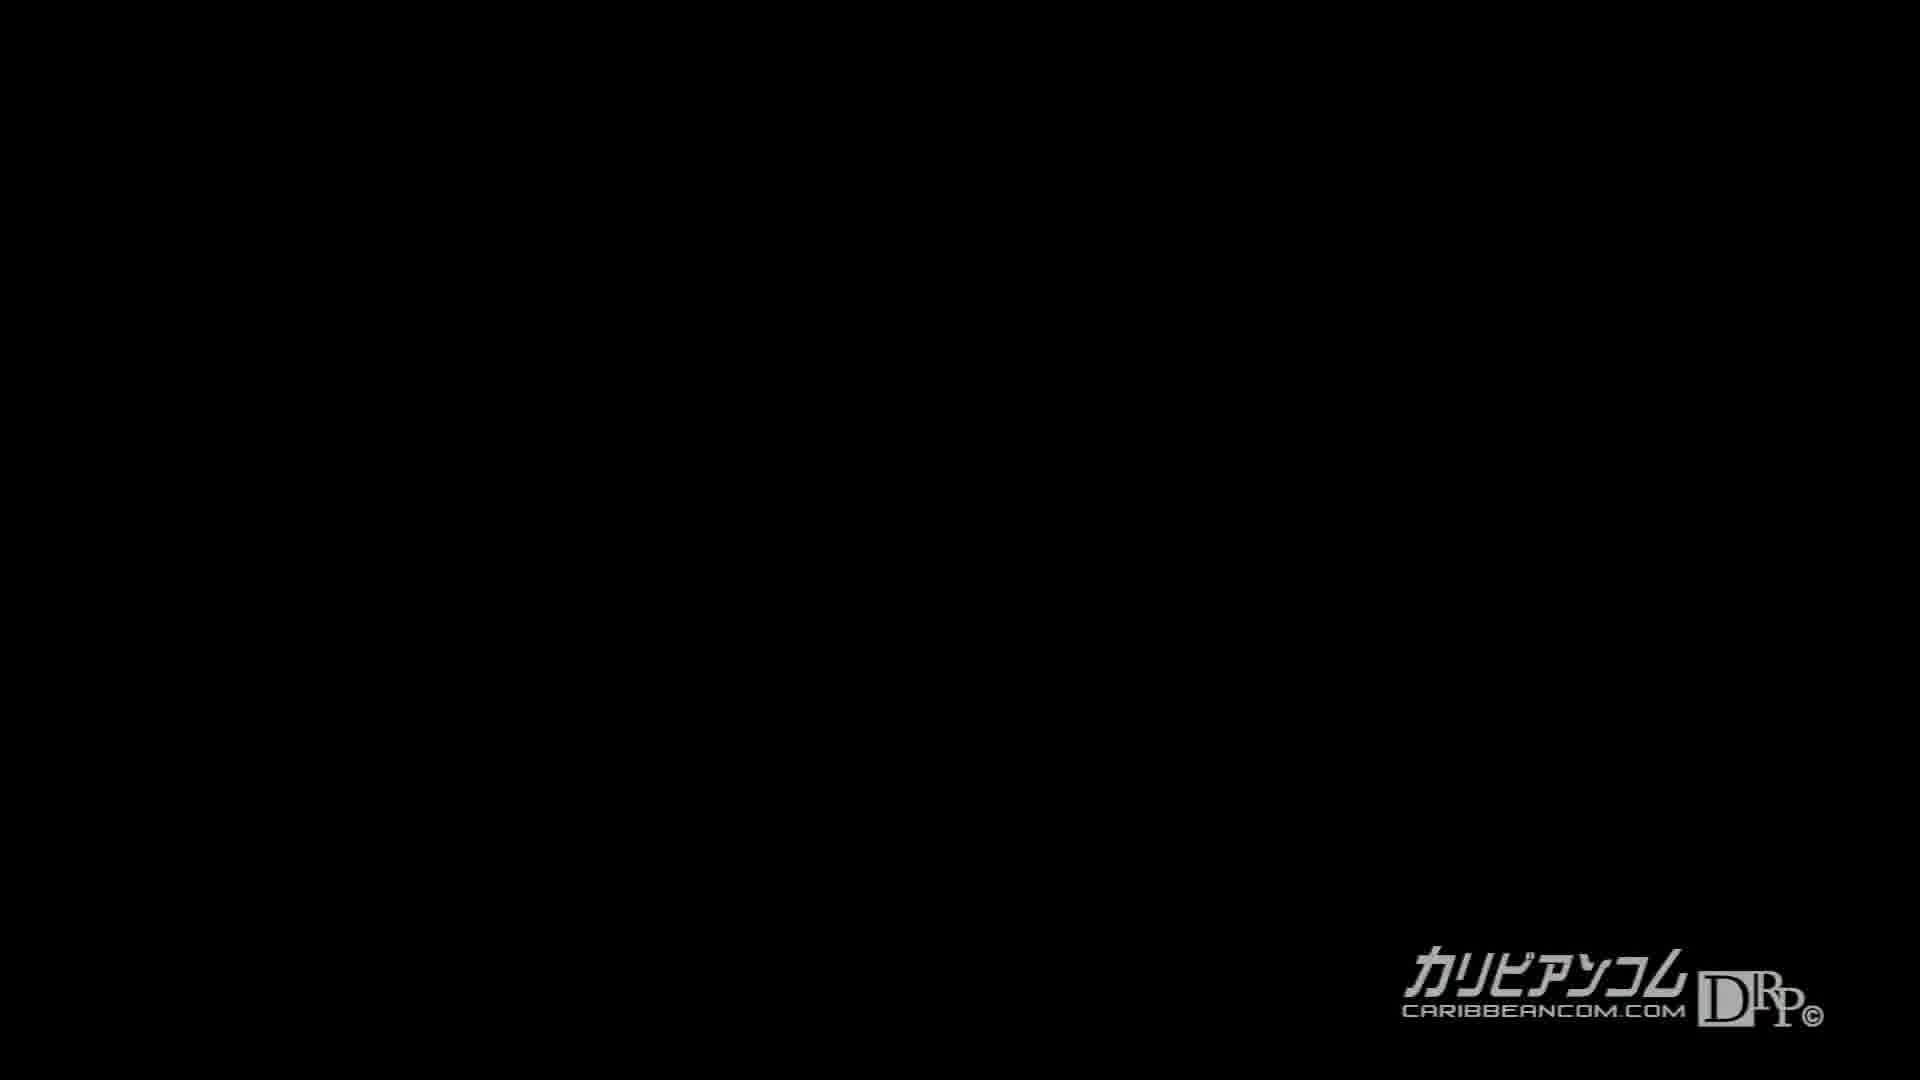 野外調教 - 本澤朋美【美乳・野外露出・カーセックス】